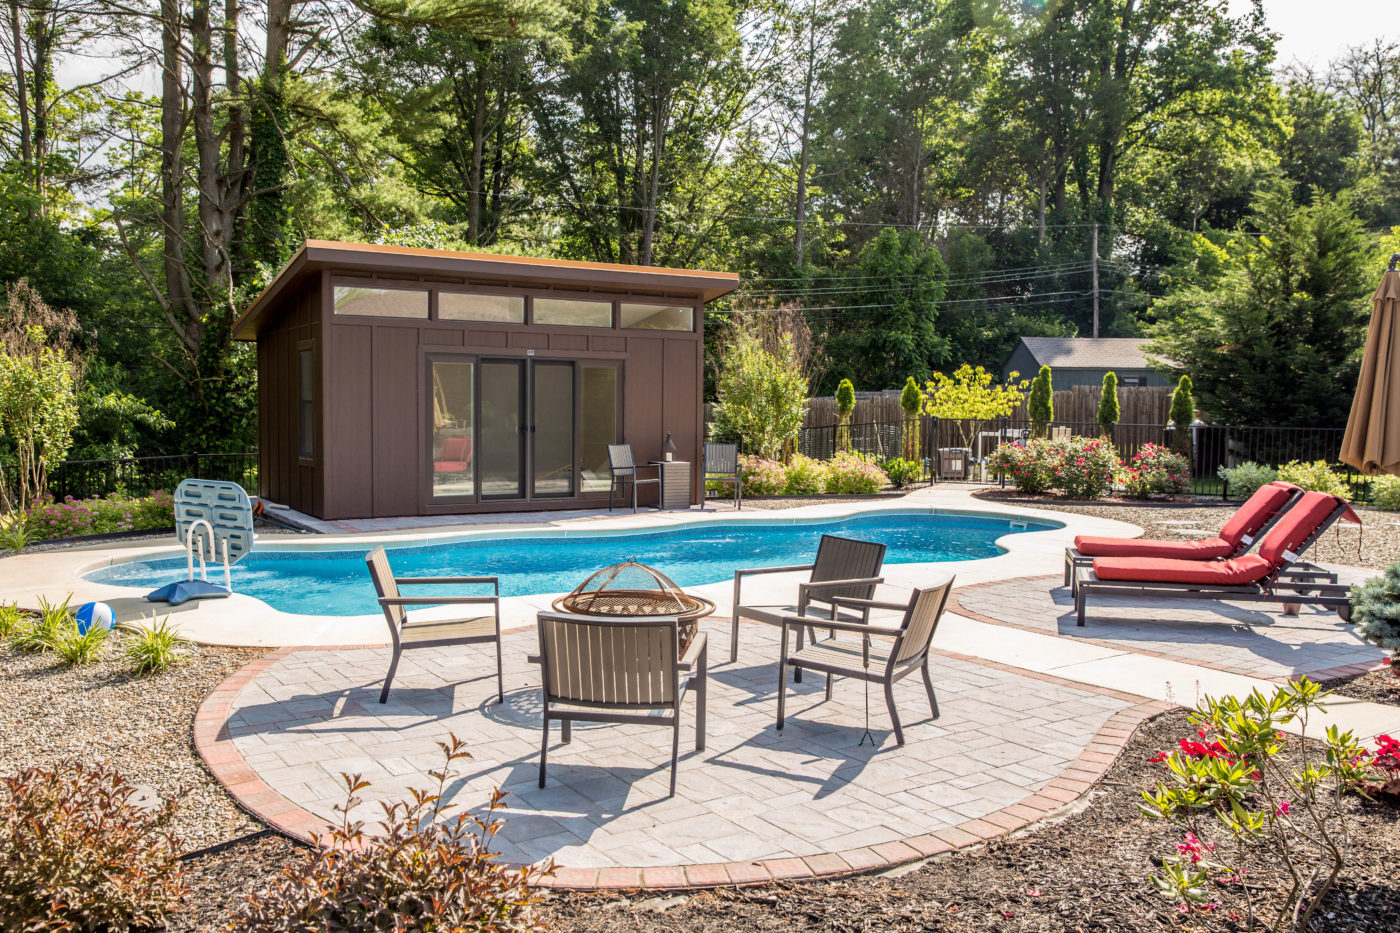 modern studio pool house cabana